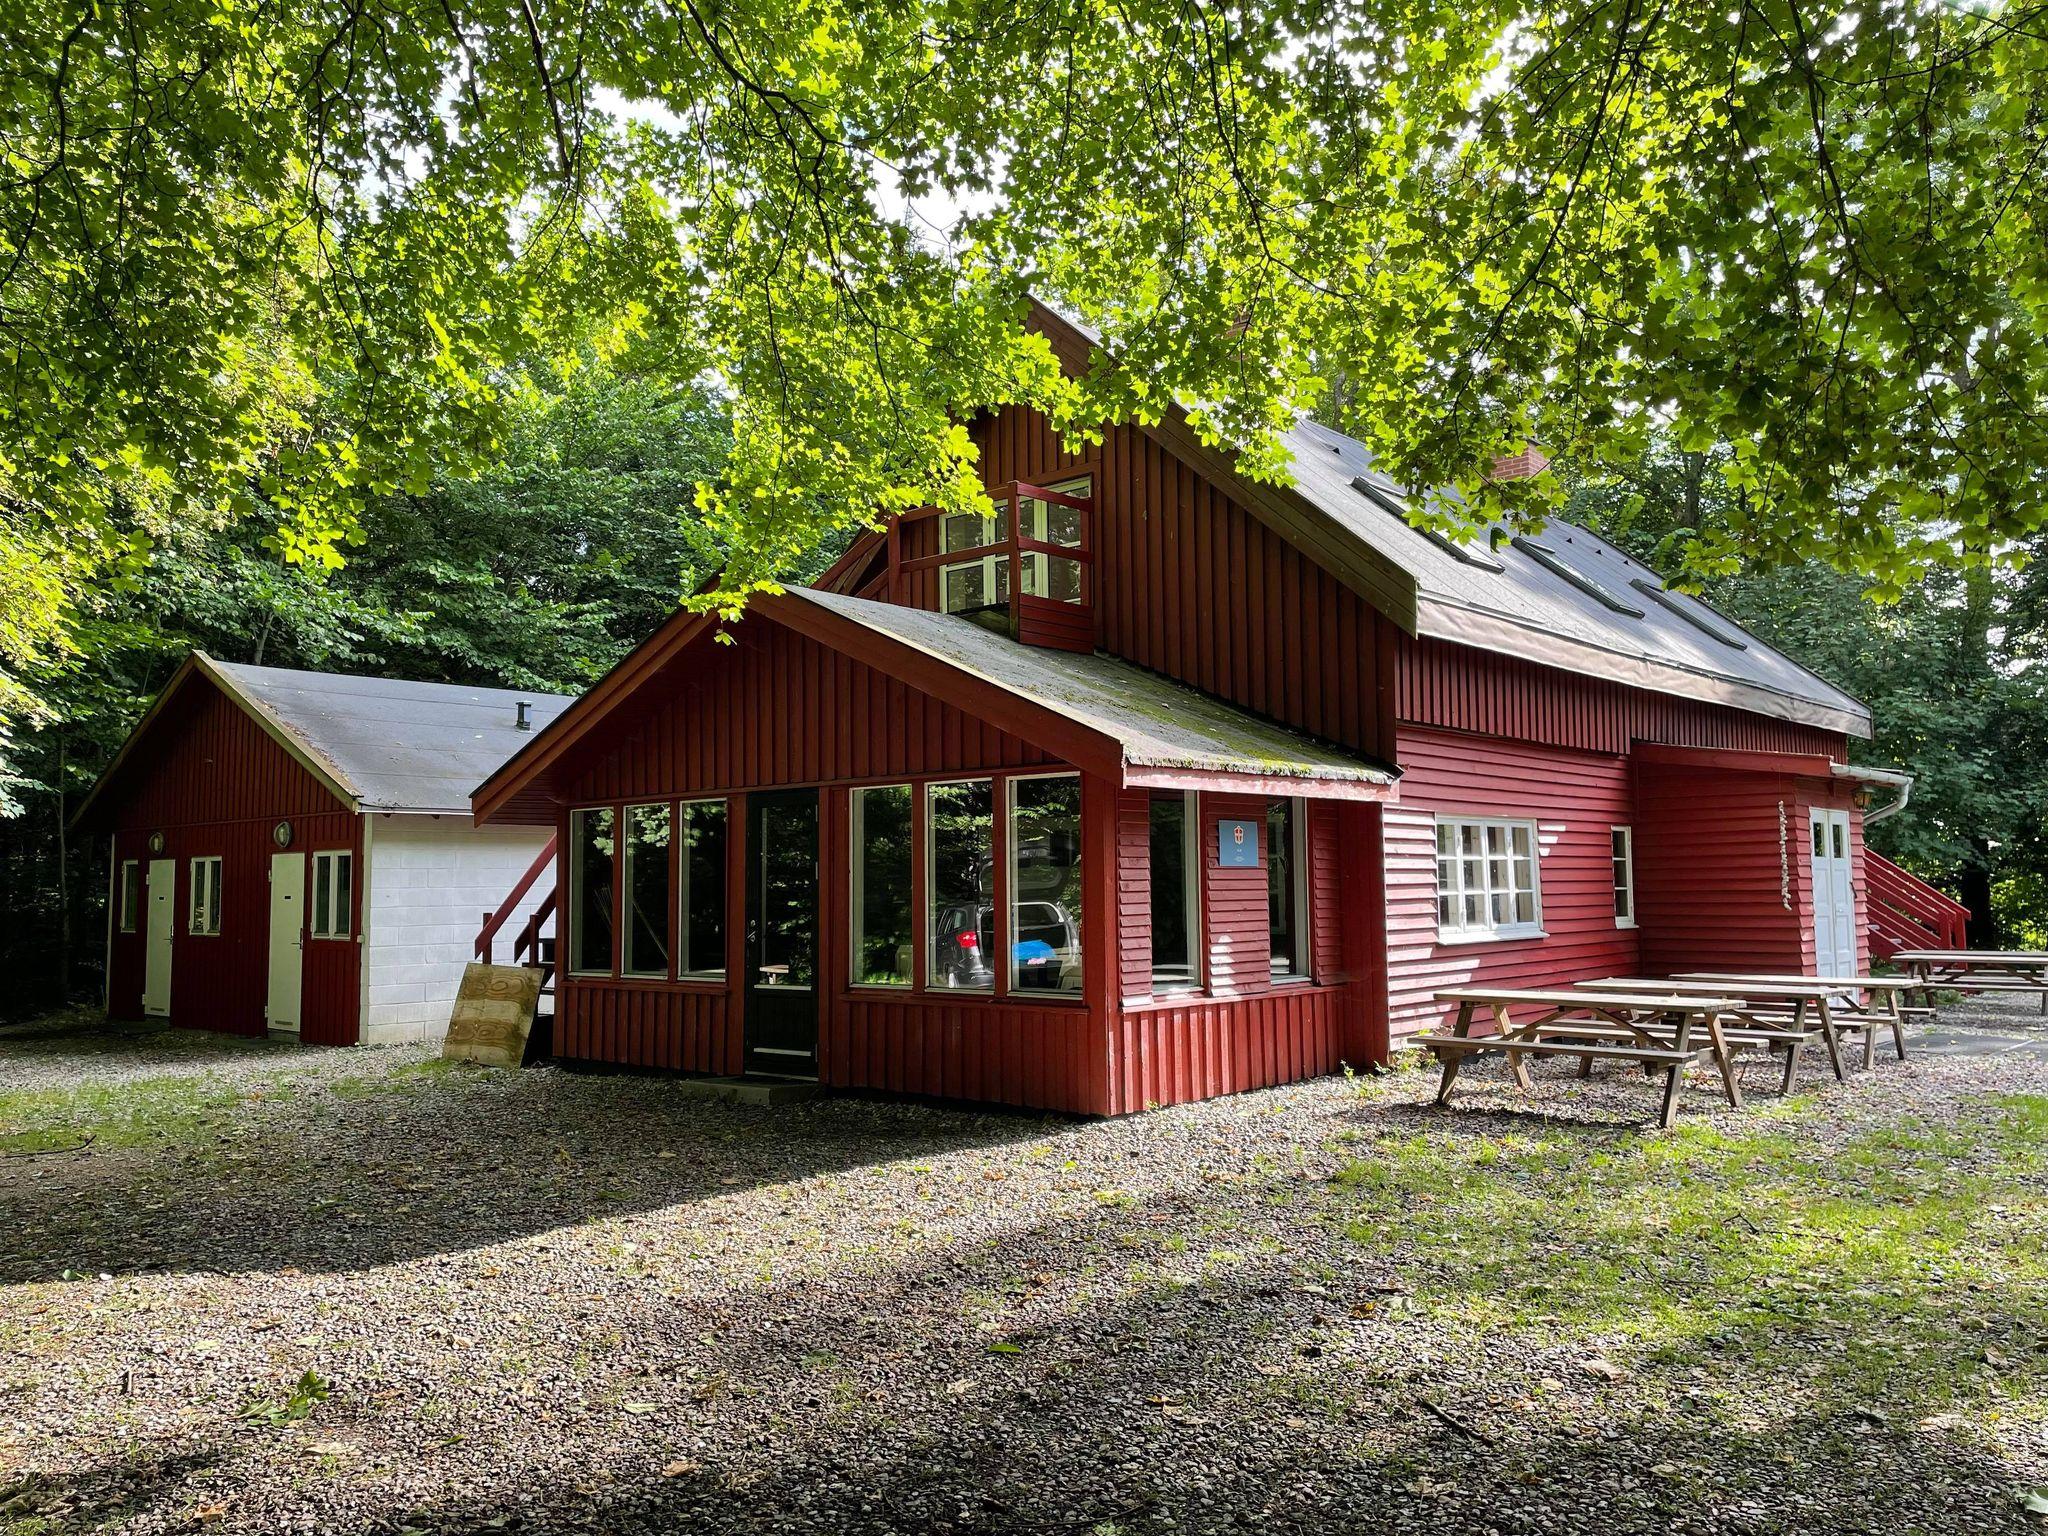 Stavnsholt Lejren